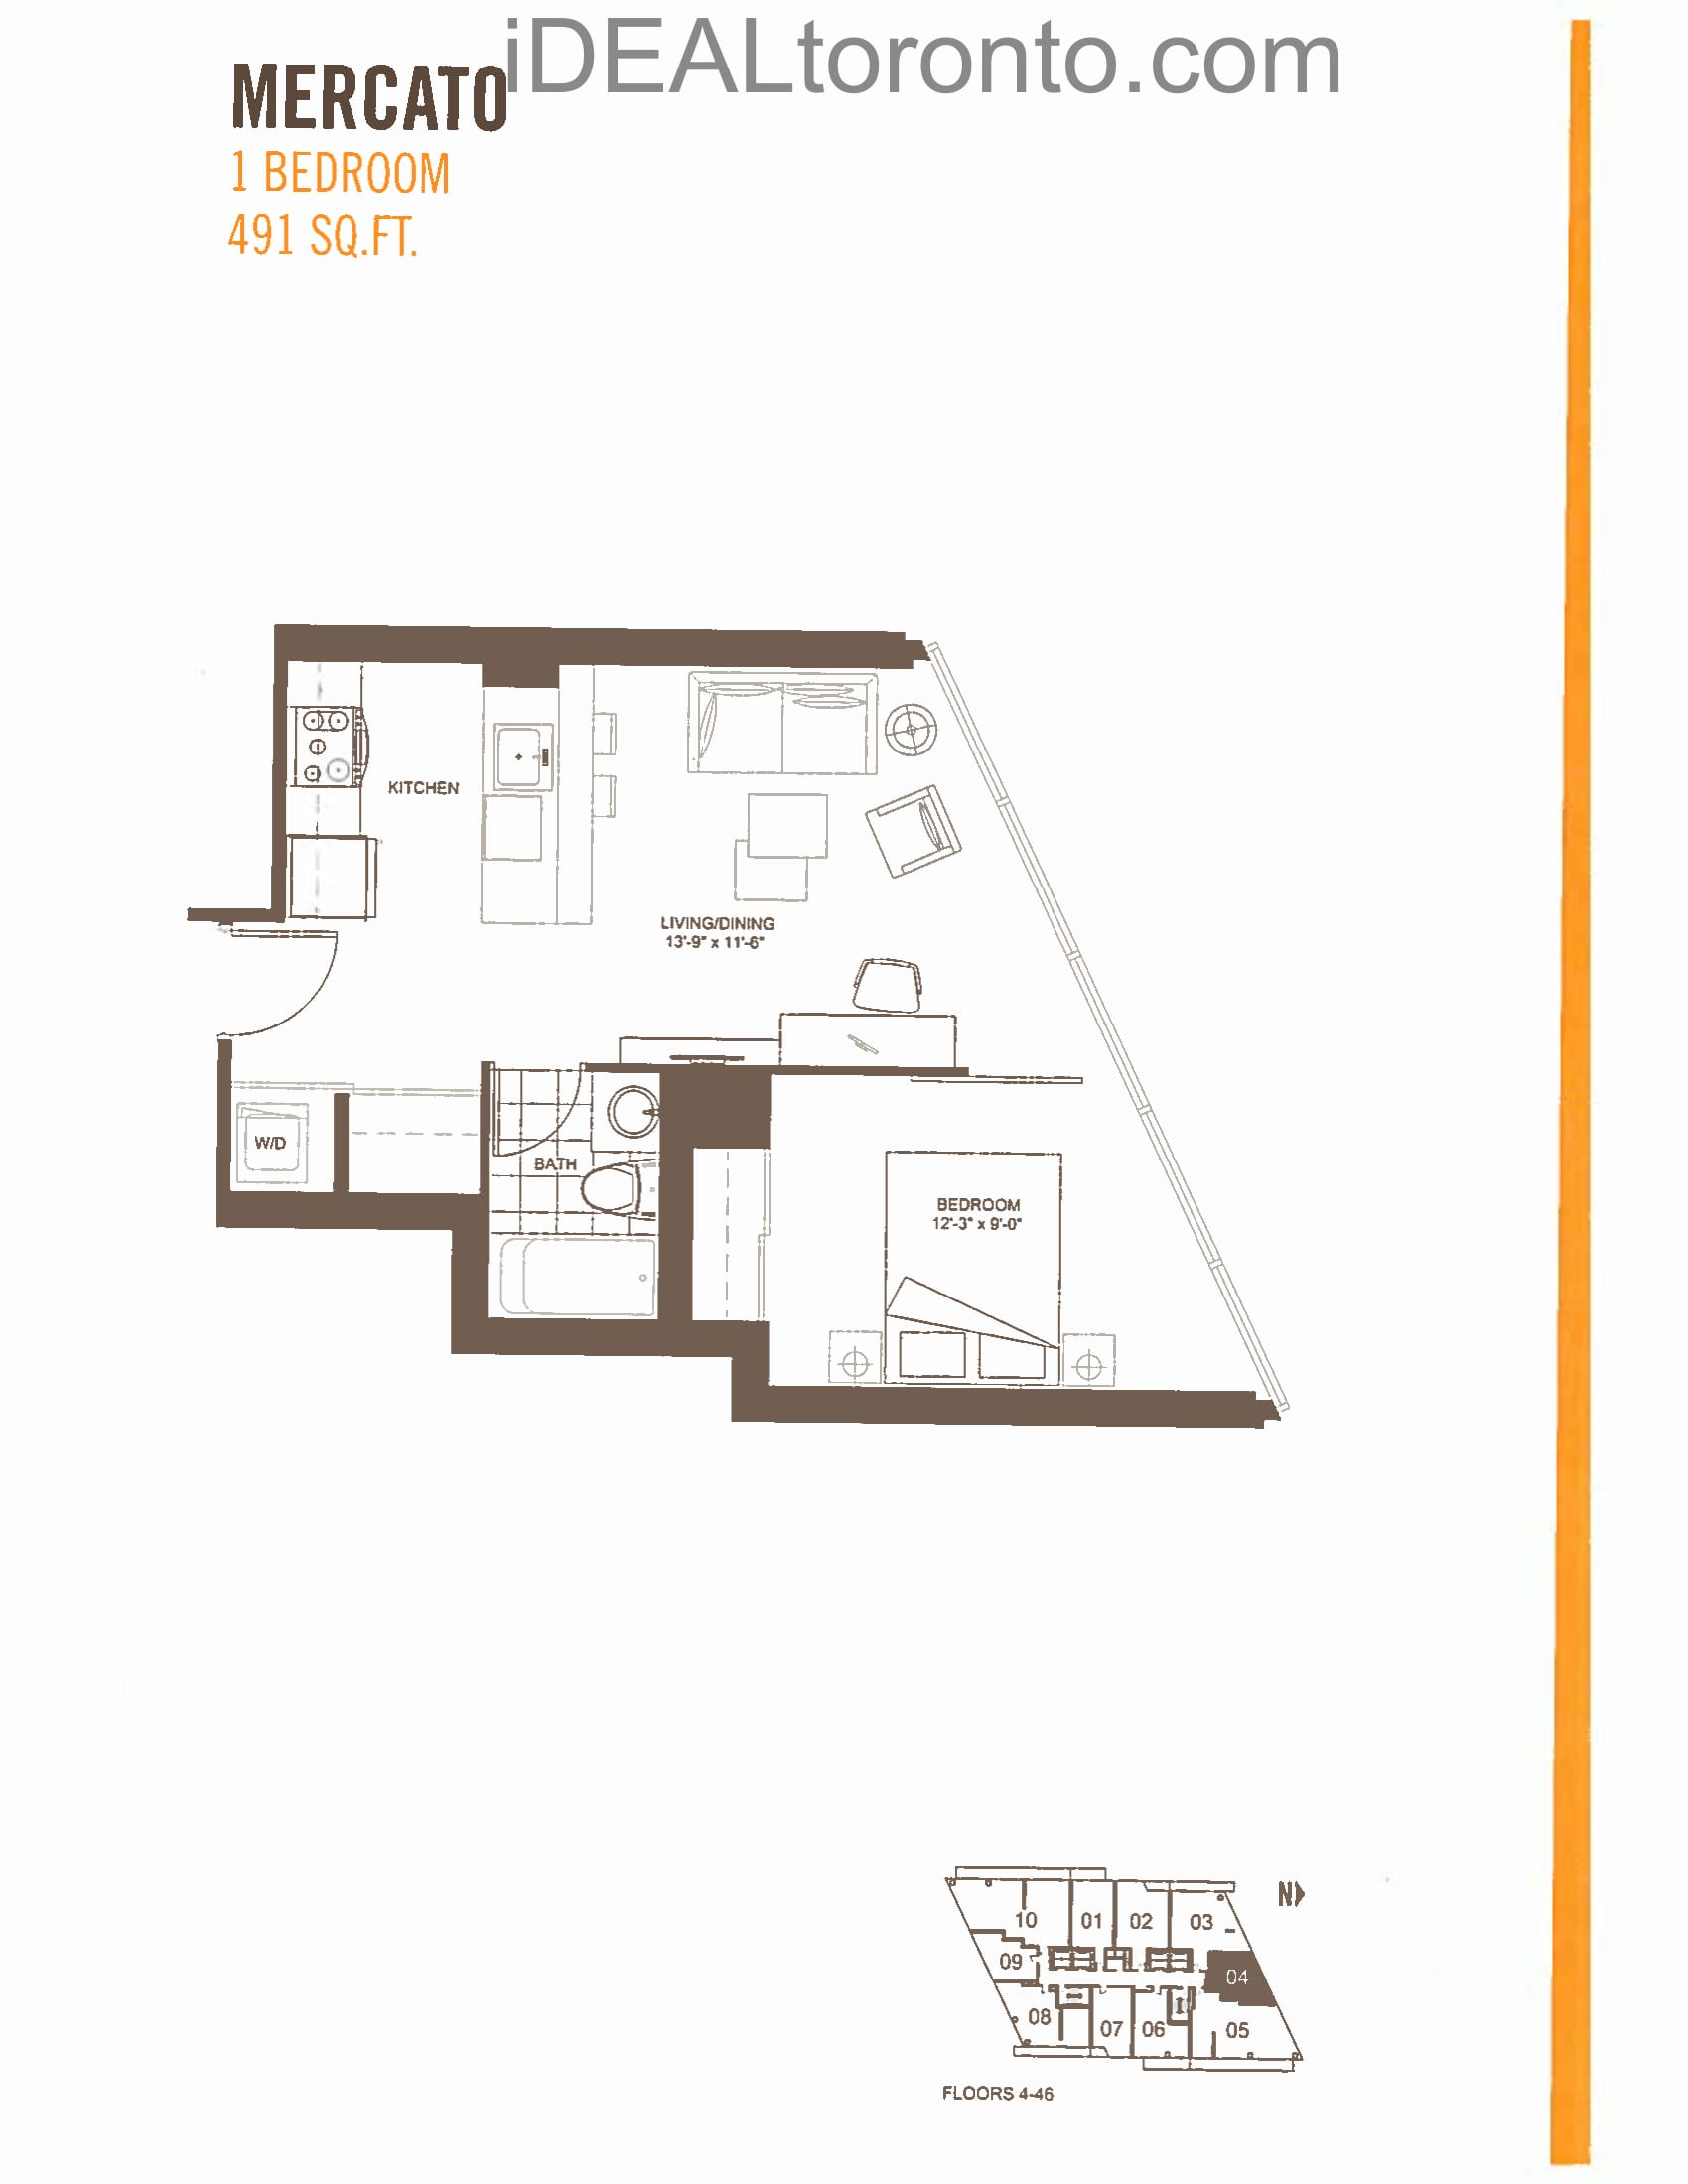 Mercato: 1 Bedroom,N, 491 SqFt